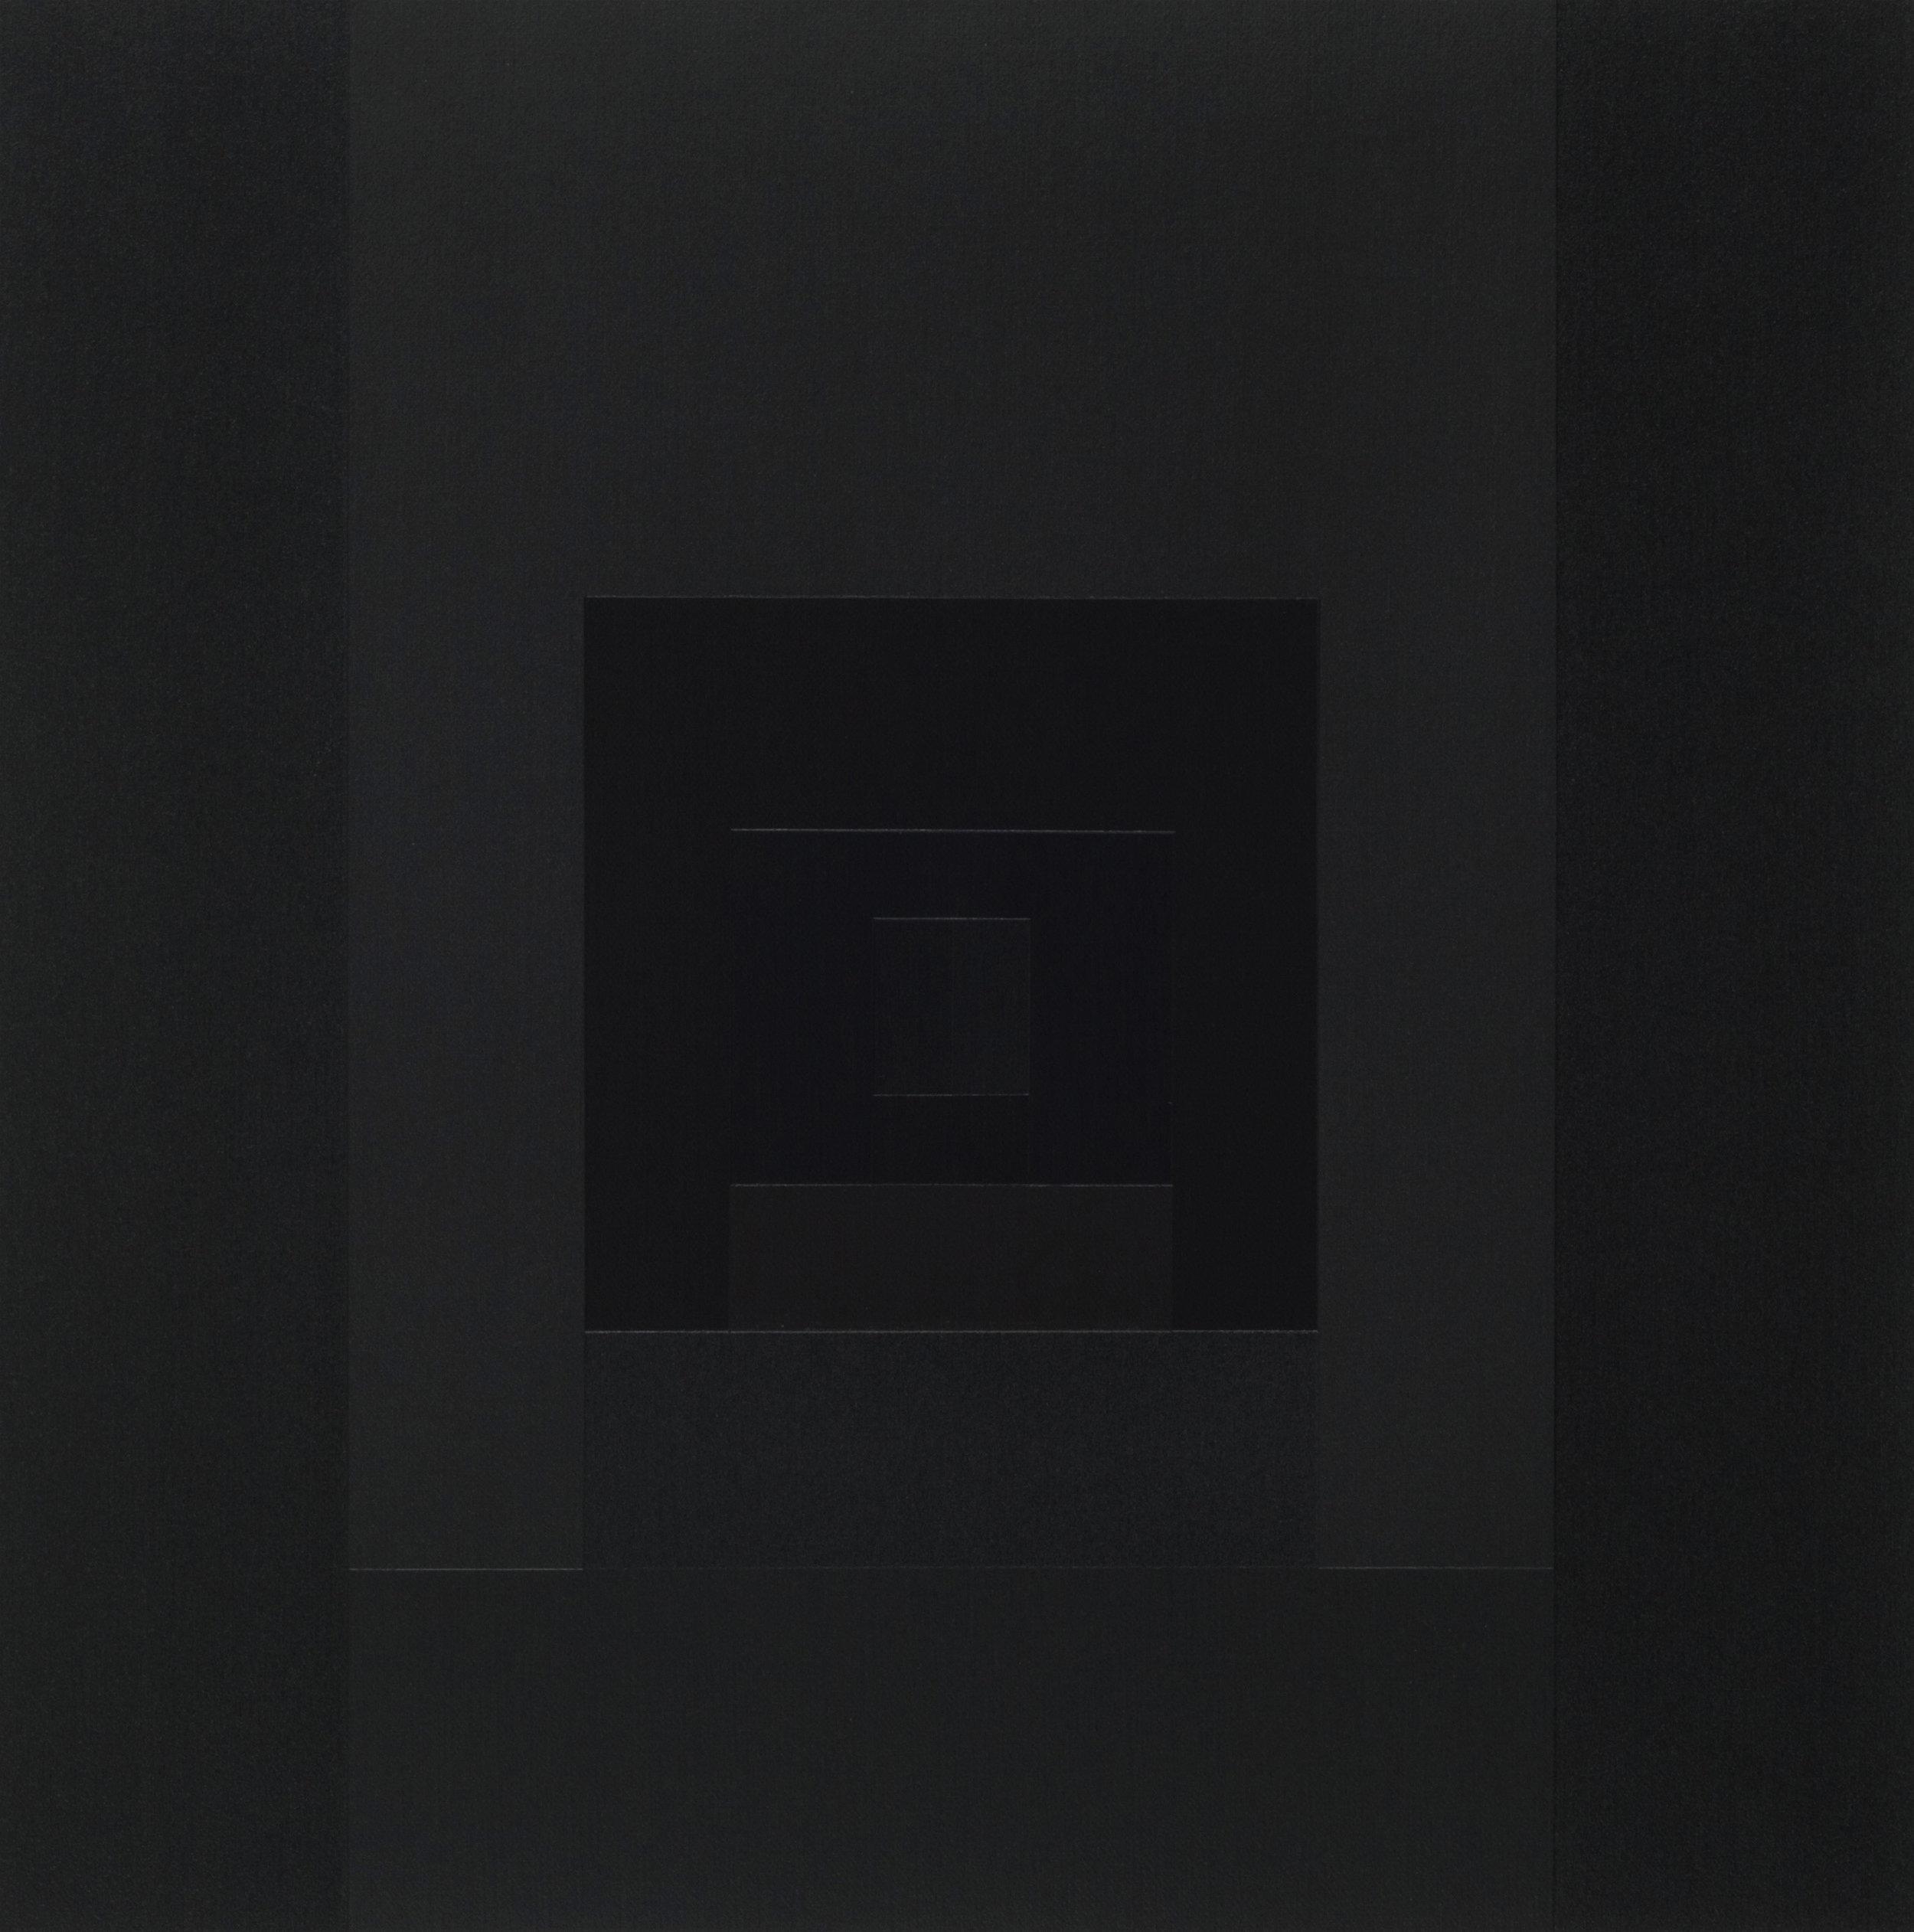 Yantra-ipsum-arkhē(4)2011.Feb, acrylic on canvas, 35 7/16 x 35 7/16 in. [90x90cm]